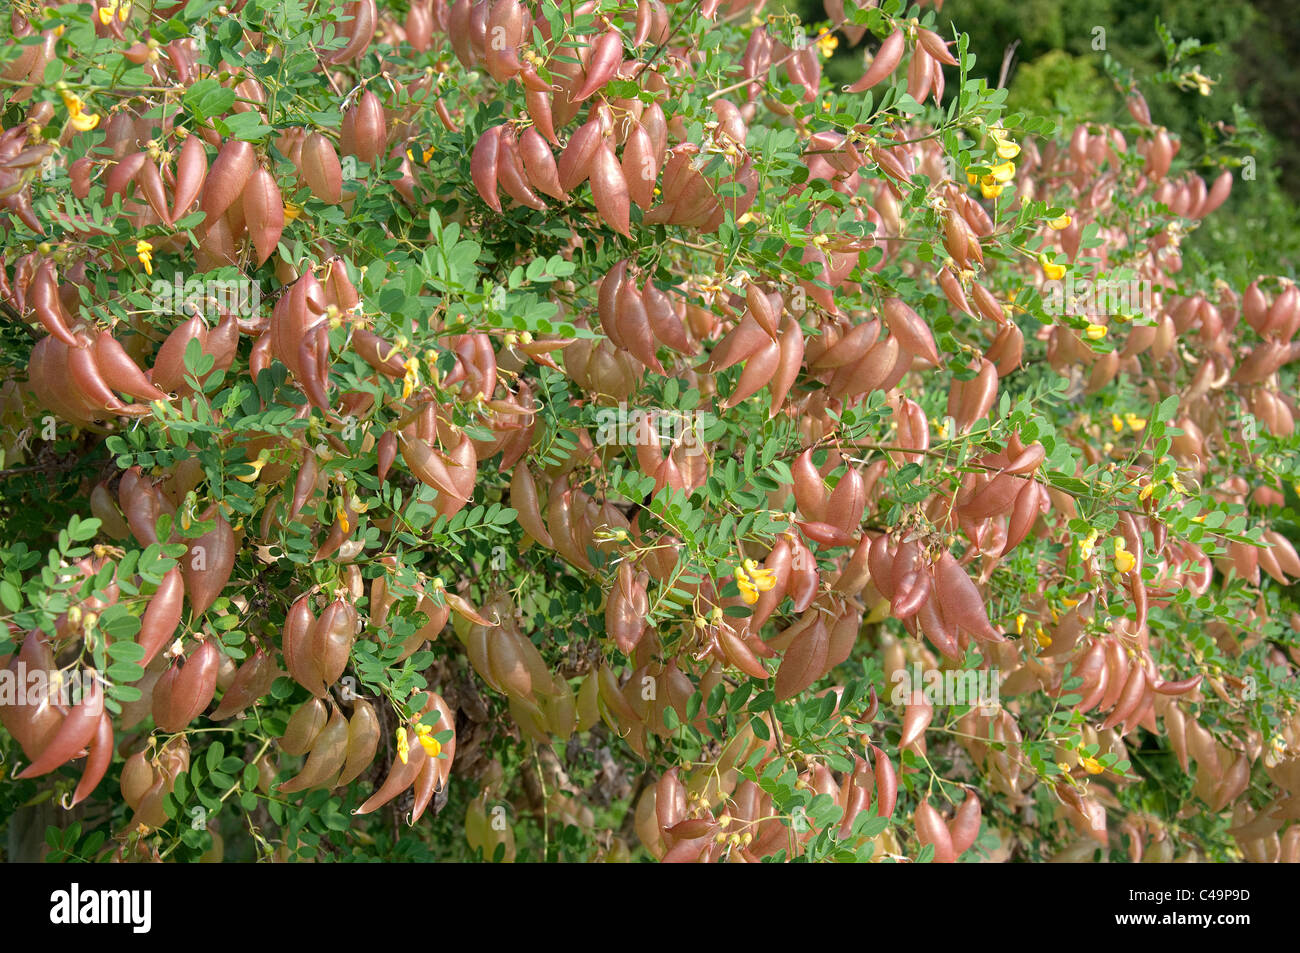 Bladder Senna (Colutea arborescens), bush with fruit. Studio picture against a white background. Stock Photo